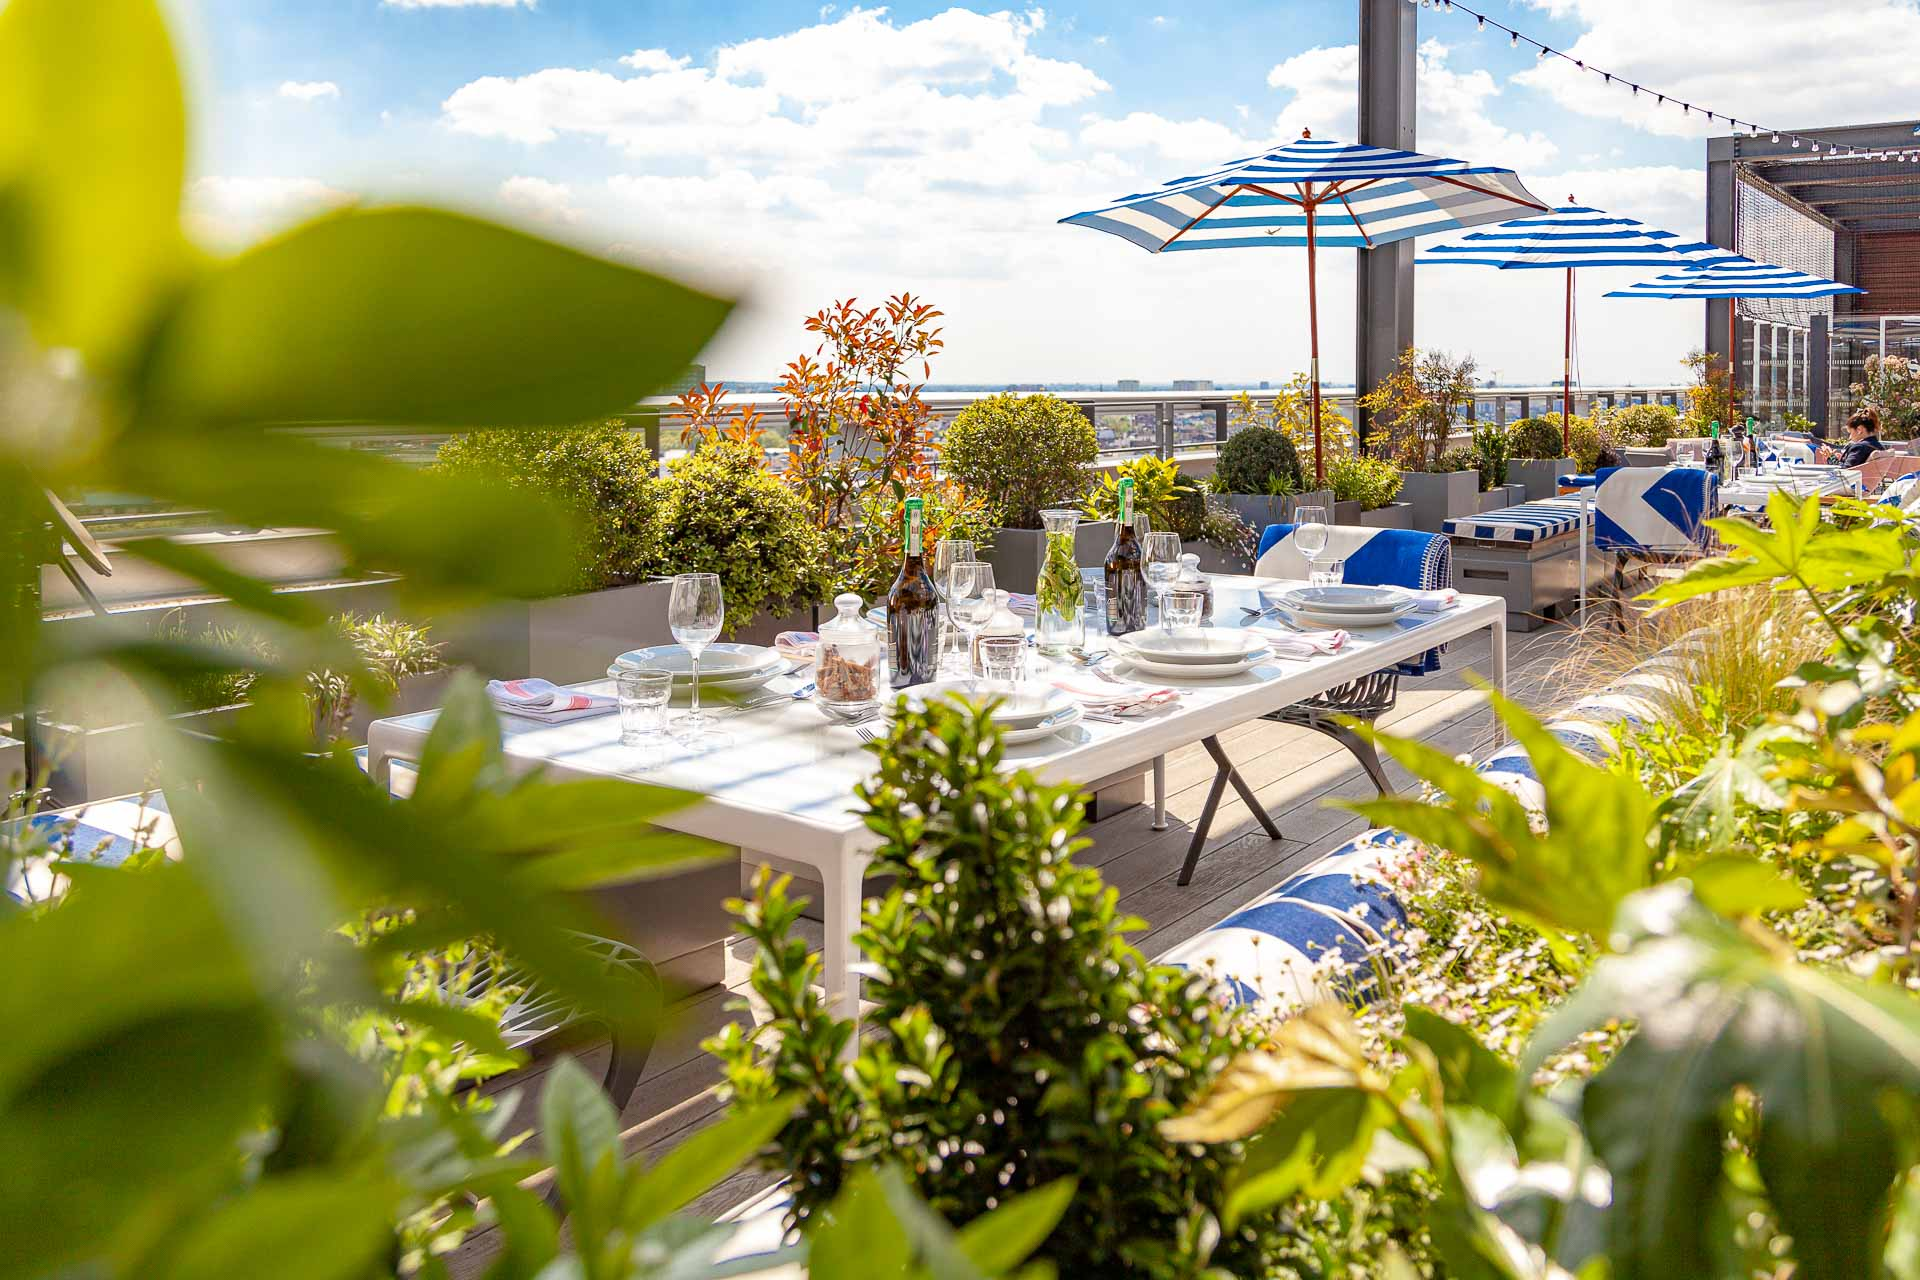 Rooftop Bar London | Skylark Roof Garden | Paddington W2 | Rooftop Terrace Cocktail Bar & Pizza Restaurant In West London